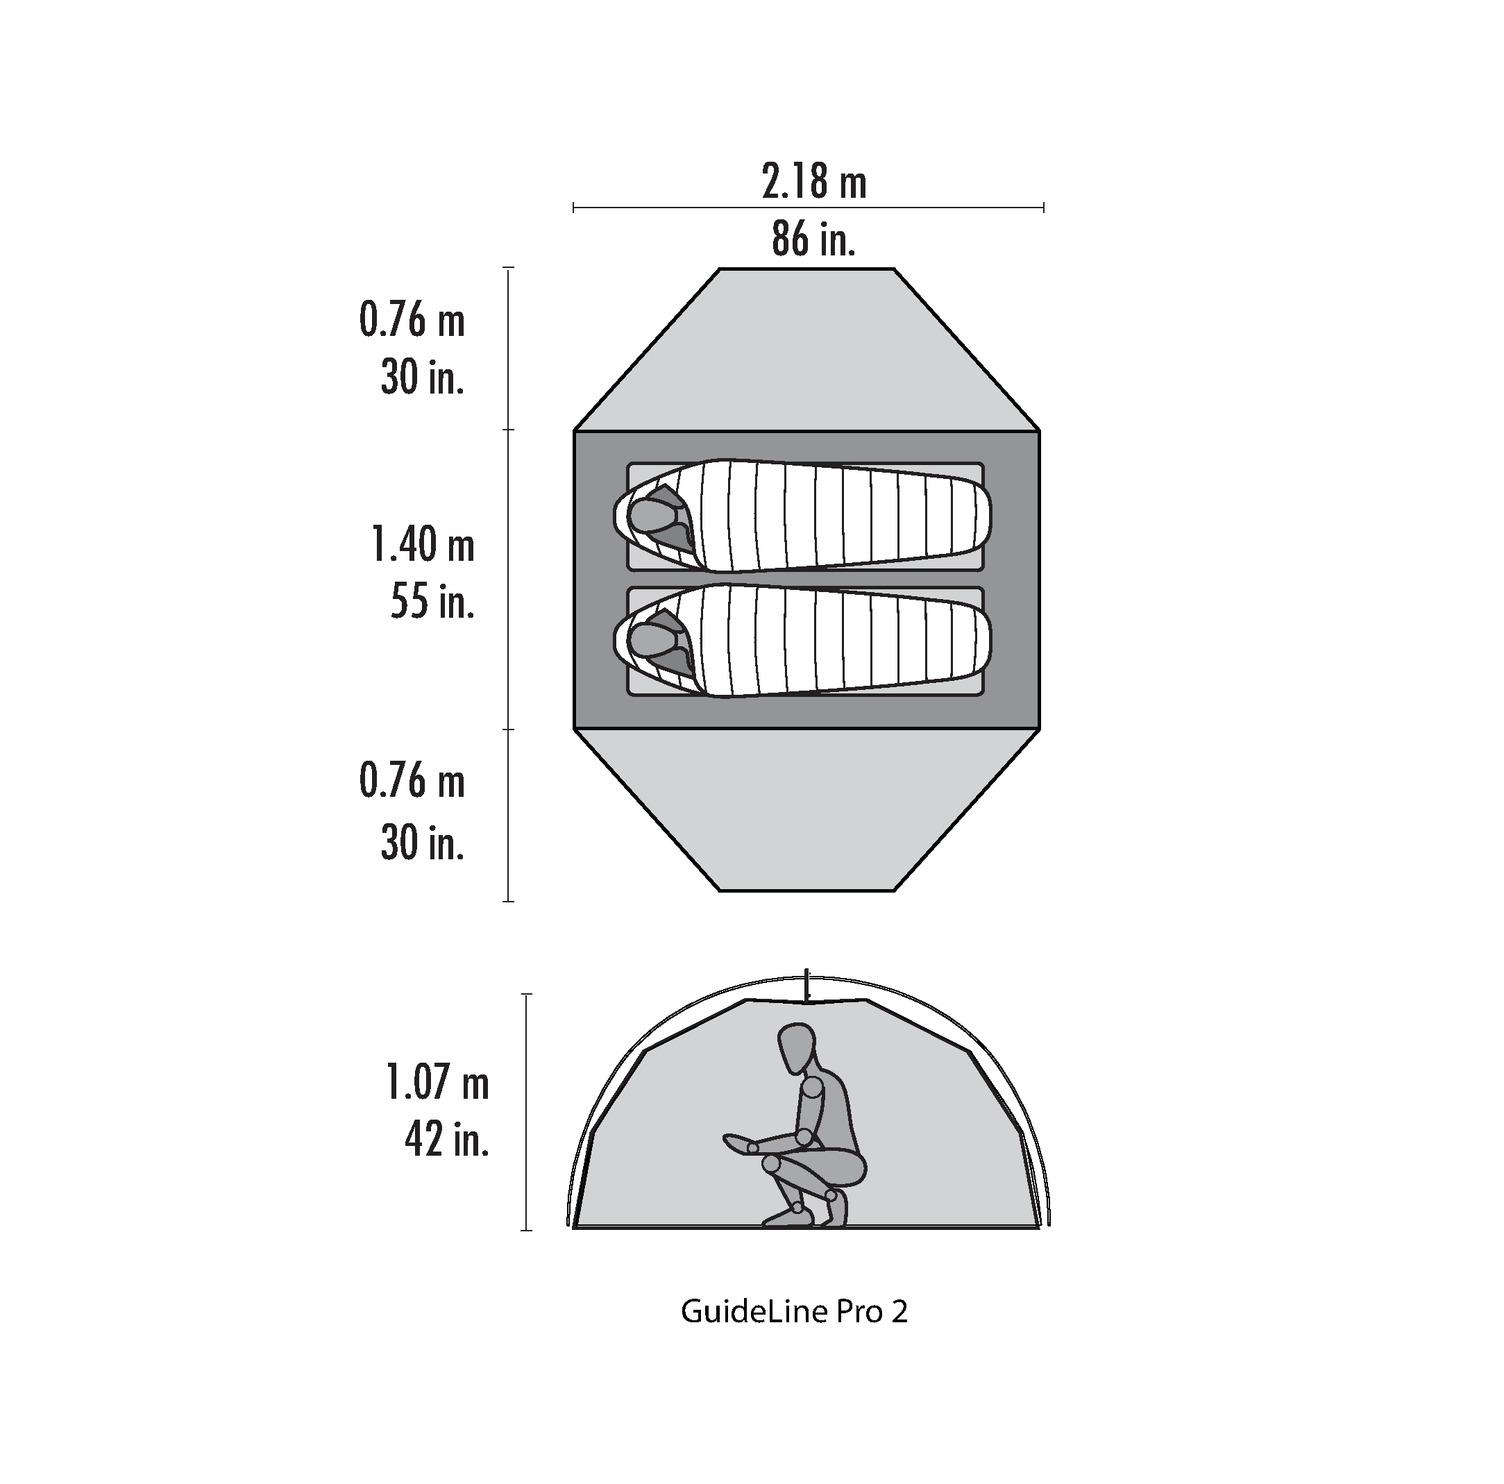 MSR - Guideline Pro 2 - robustes 2-Personen-Zelt *inkl. Footprint* – Bild 6